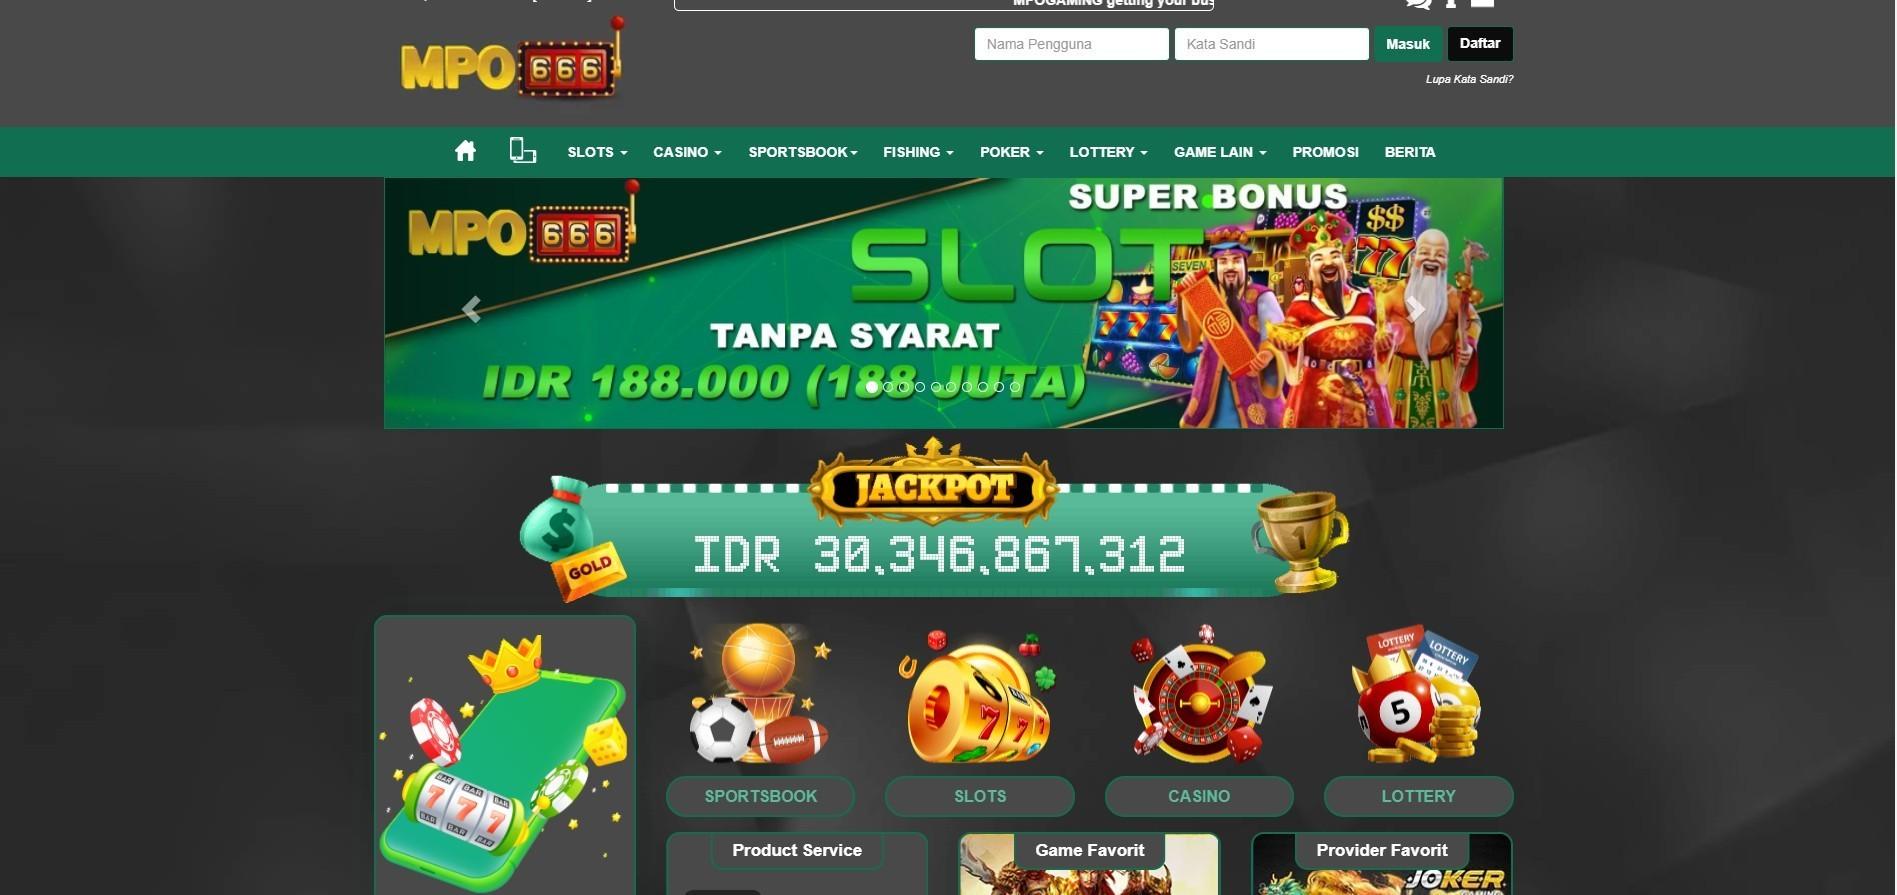 Jual Tiket Mpo666 Situs Judii Slots Online Gampang Menang Loket Com